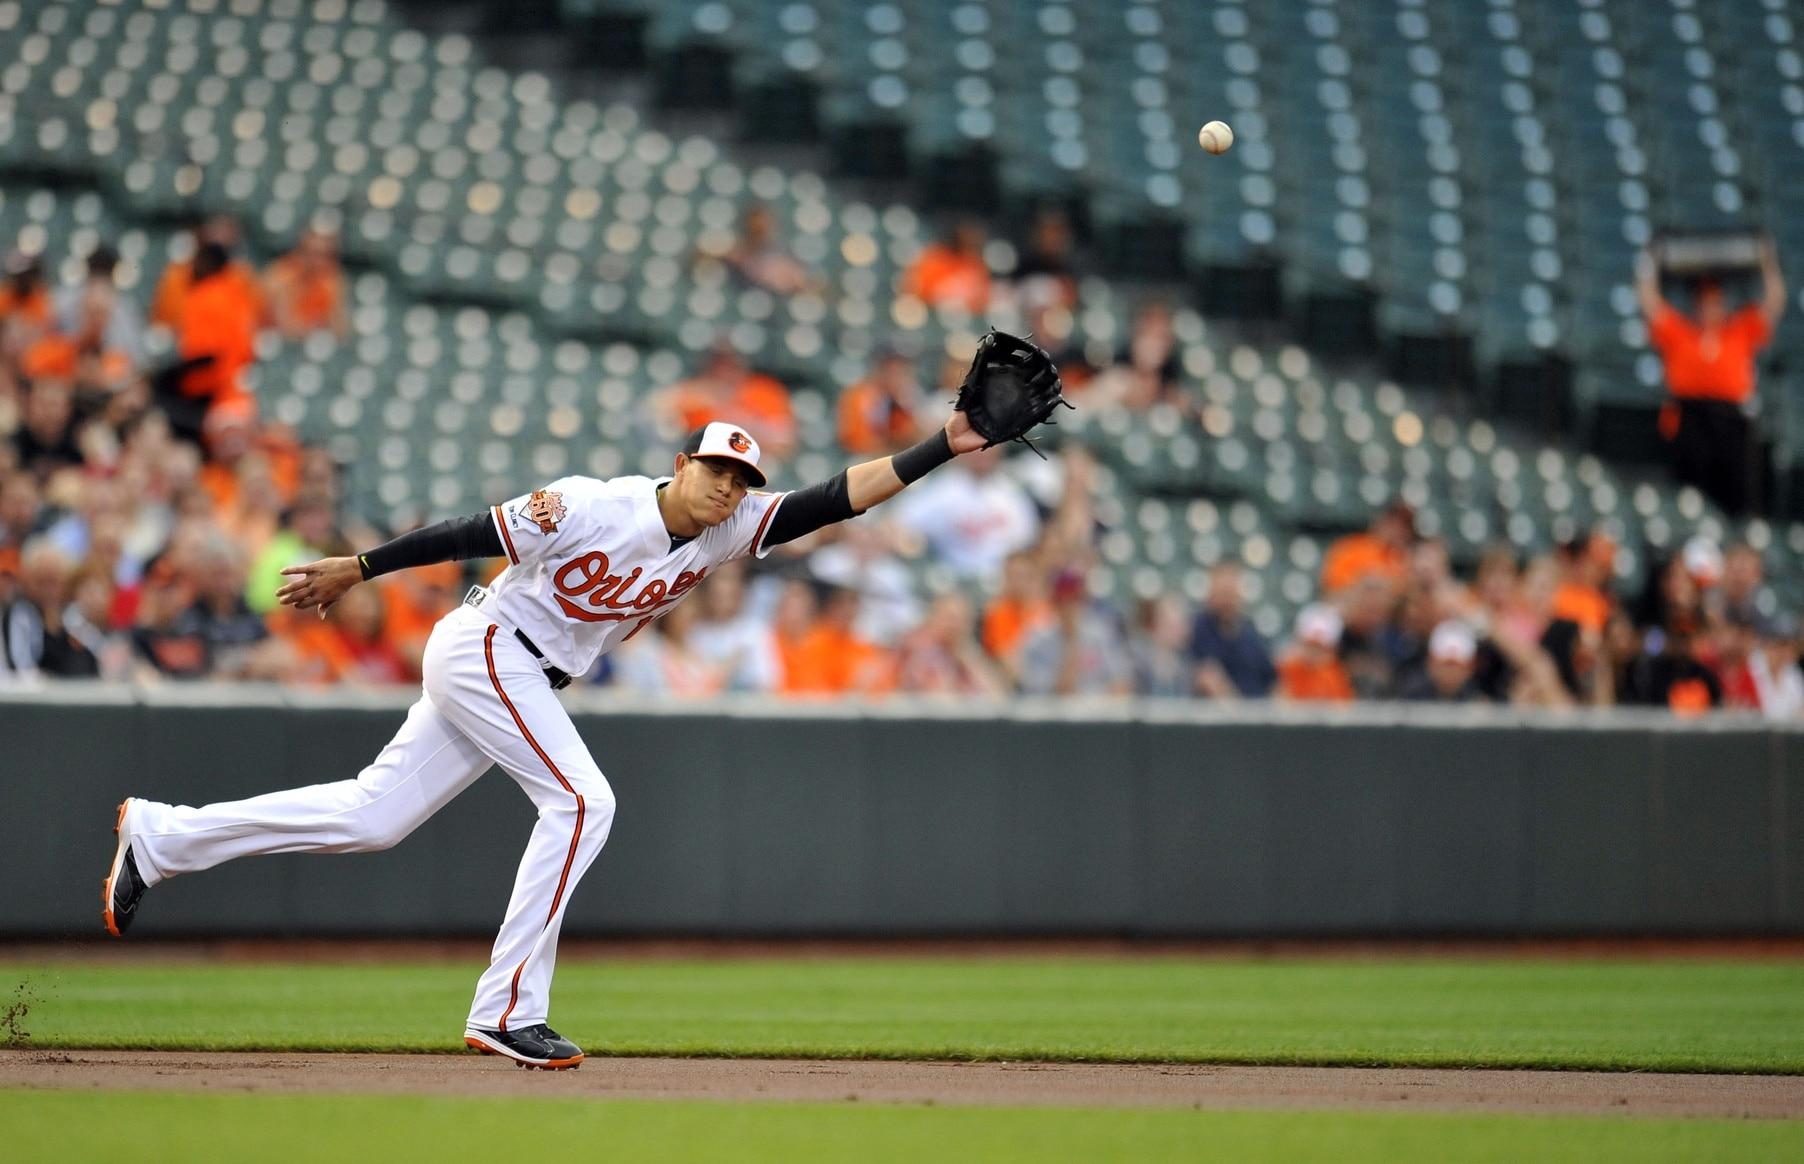 Manny Machado of the Baltimore Orioles